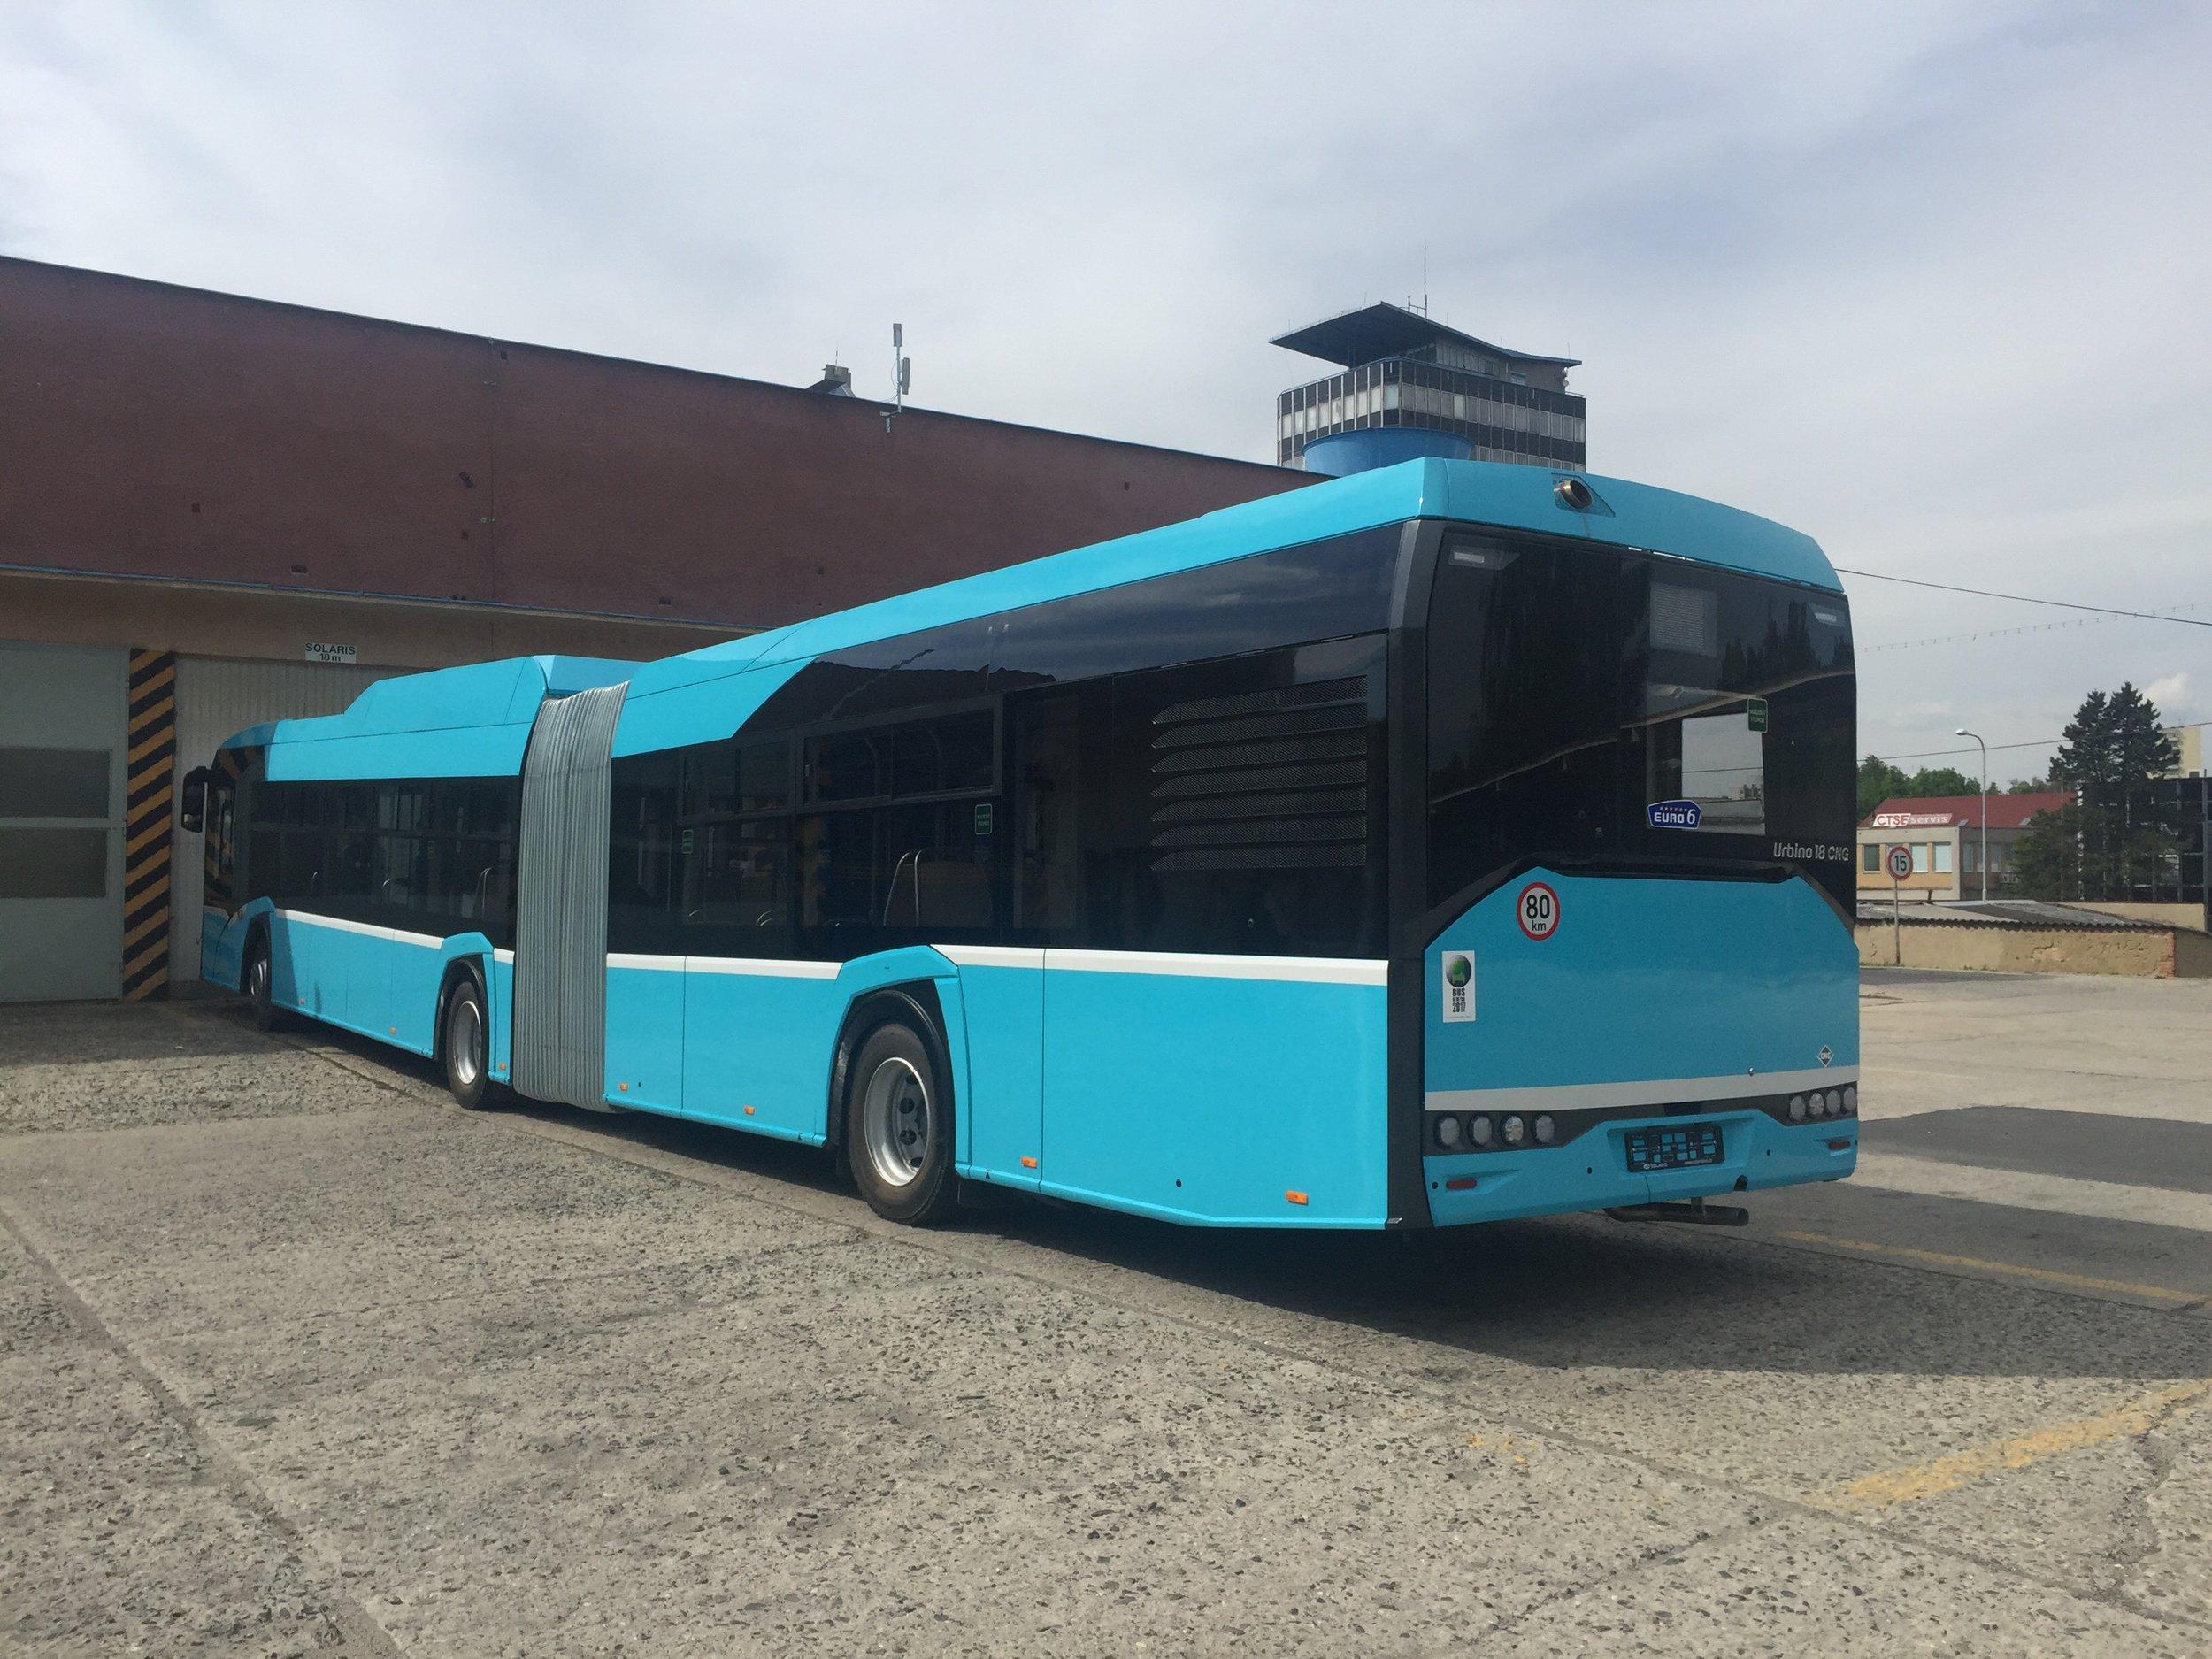 První ostravský vůz Solaris Urbino 18 CNG v provedení tzv. Nového Urbina v areálu porubských autobusových garáží.